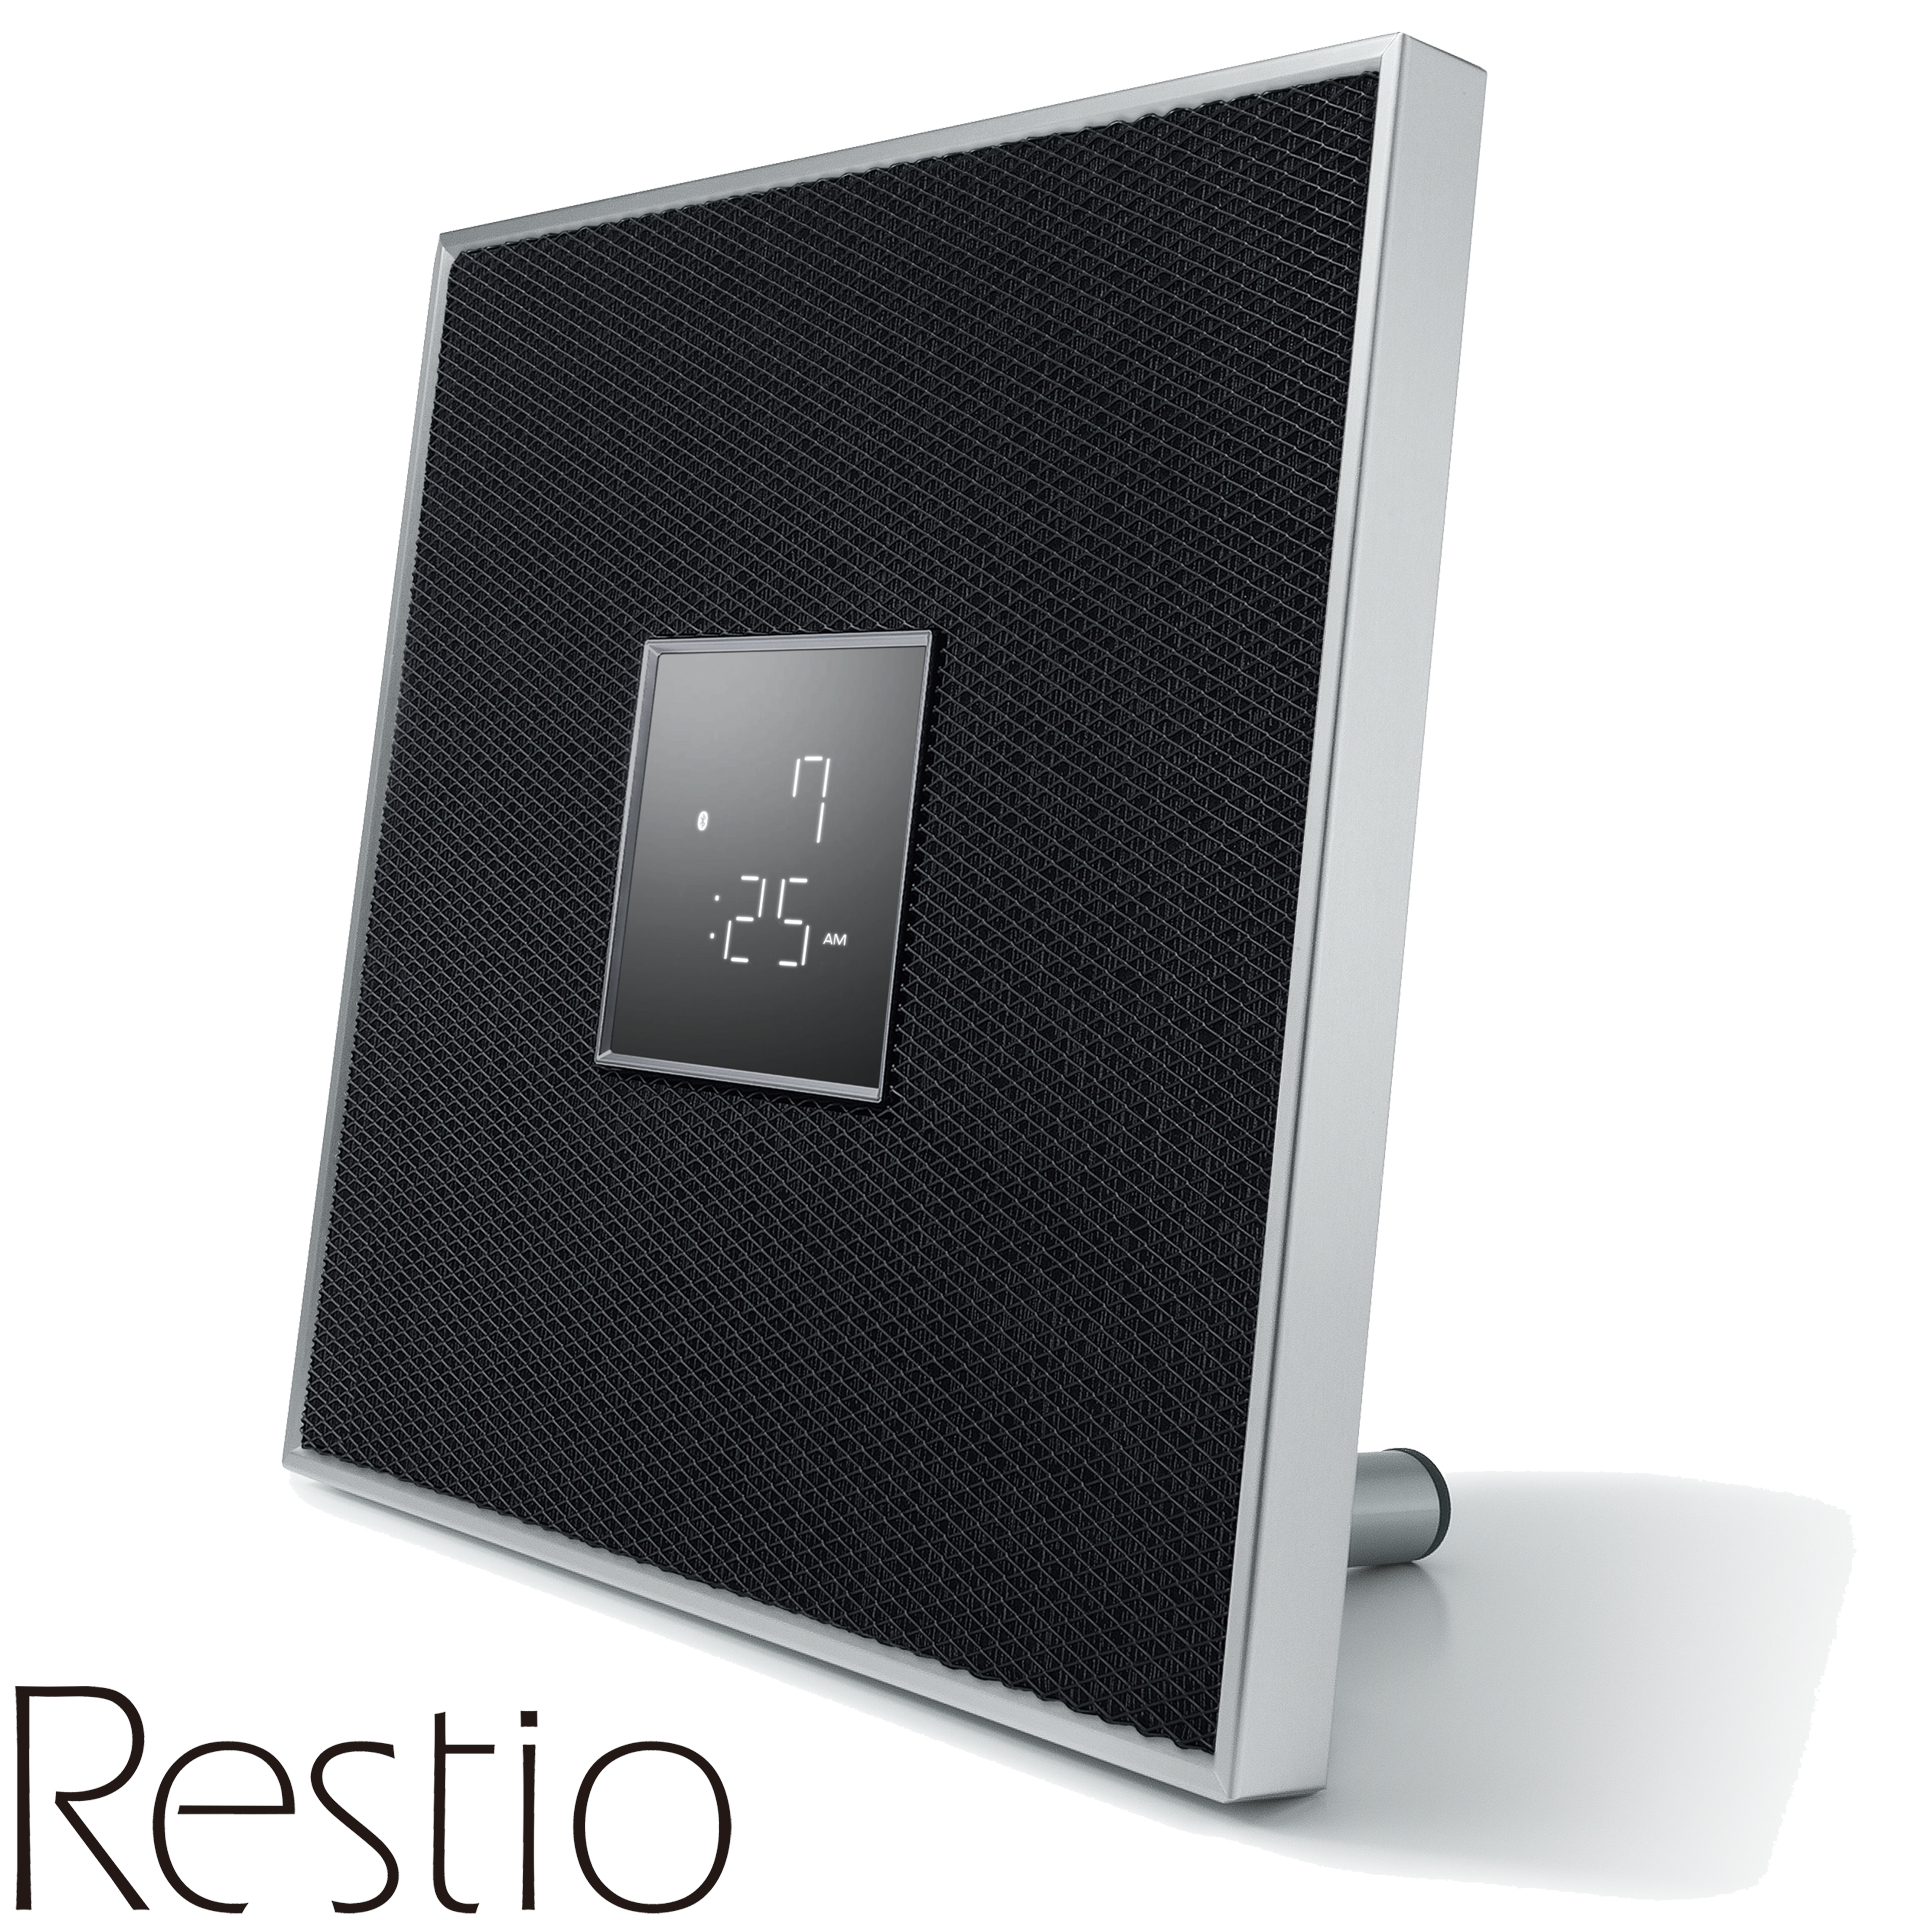 Restioシリーズ ISX-80(B)